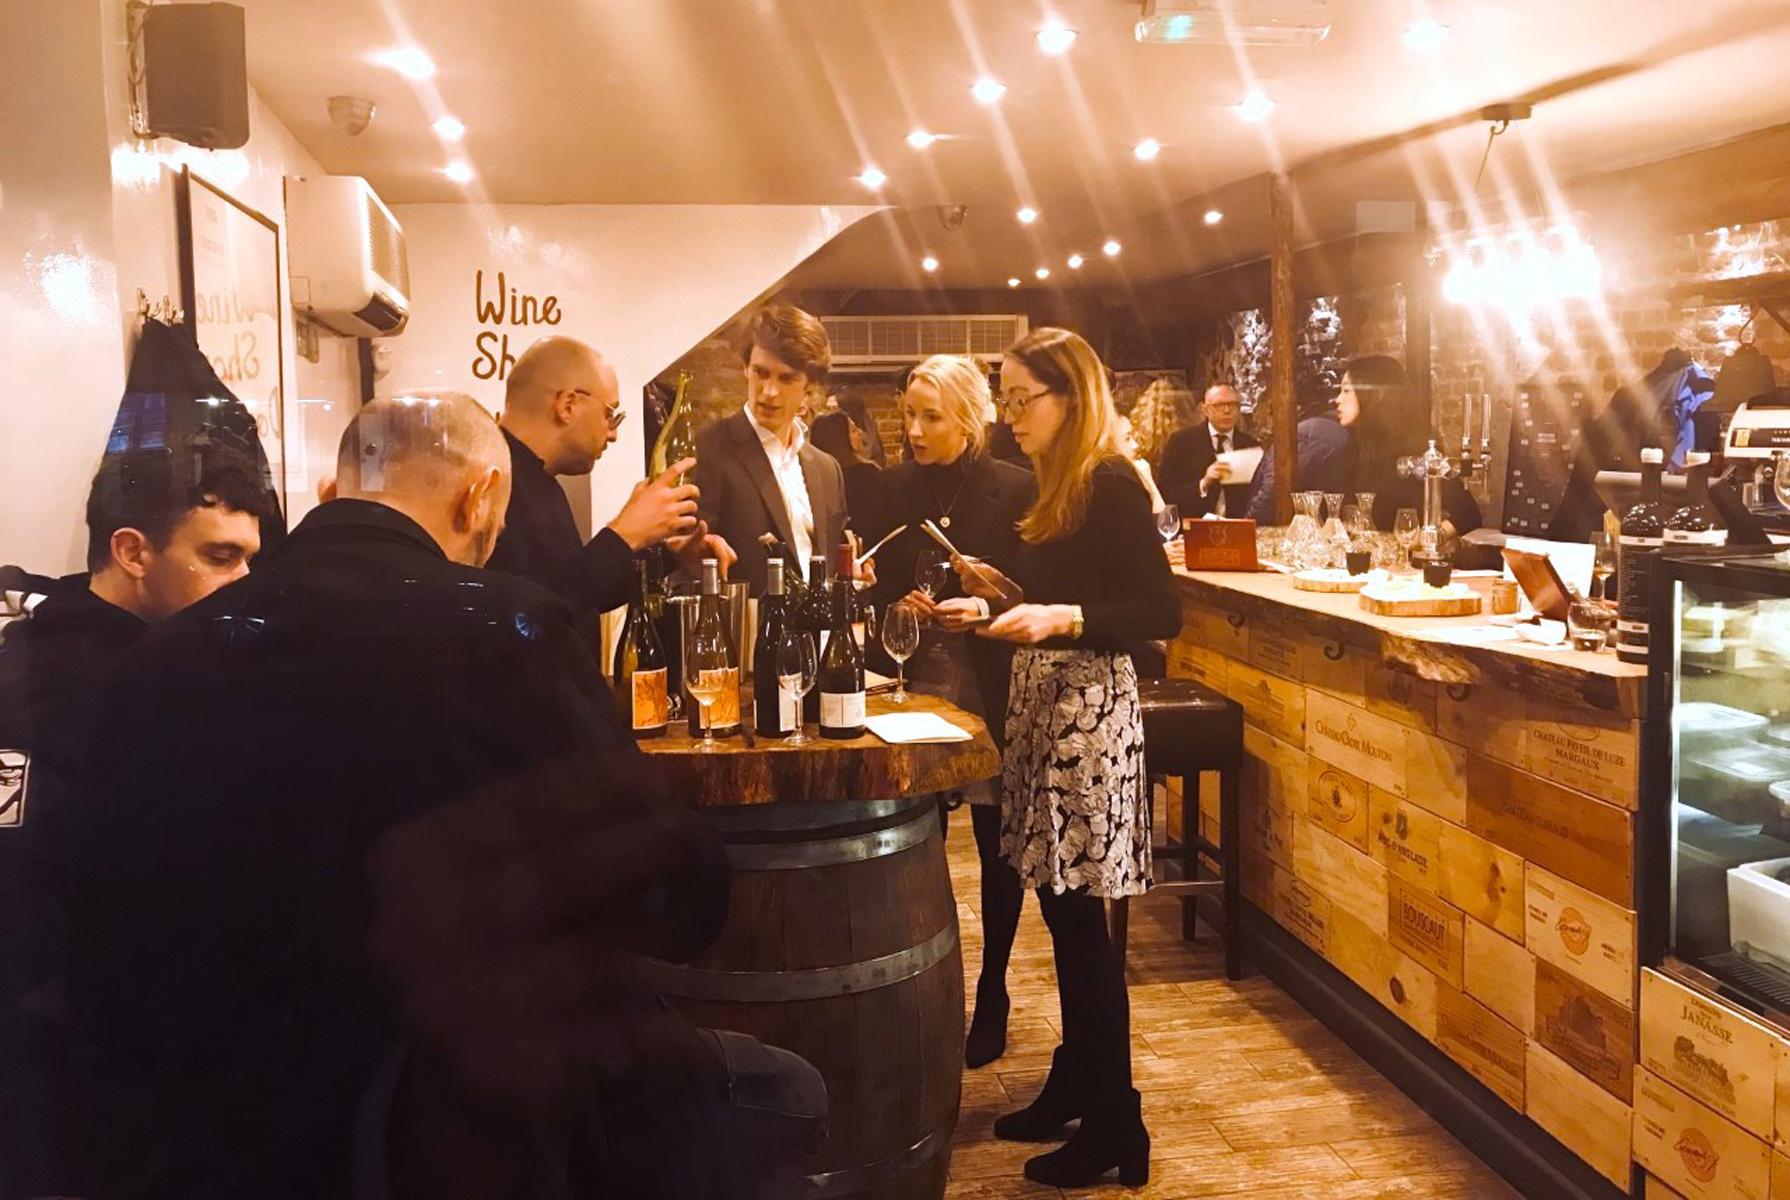 Wine-tasting-at-Le-Cellar